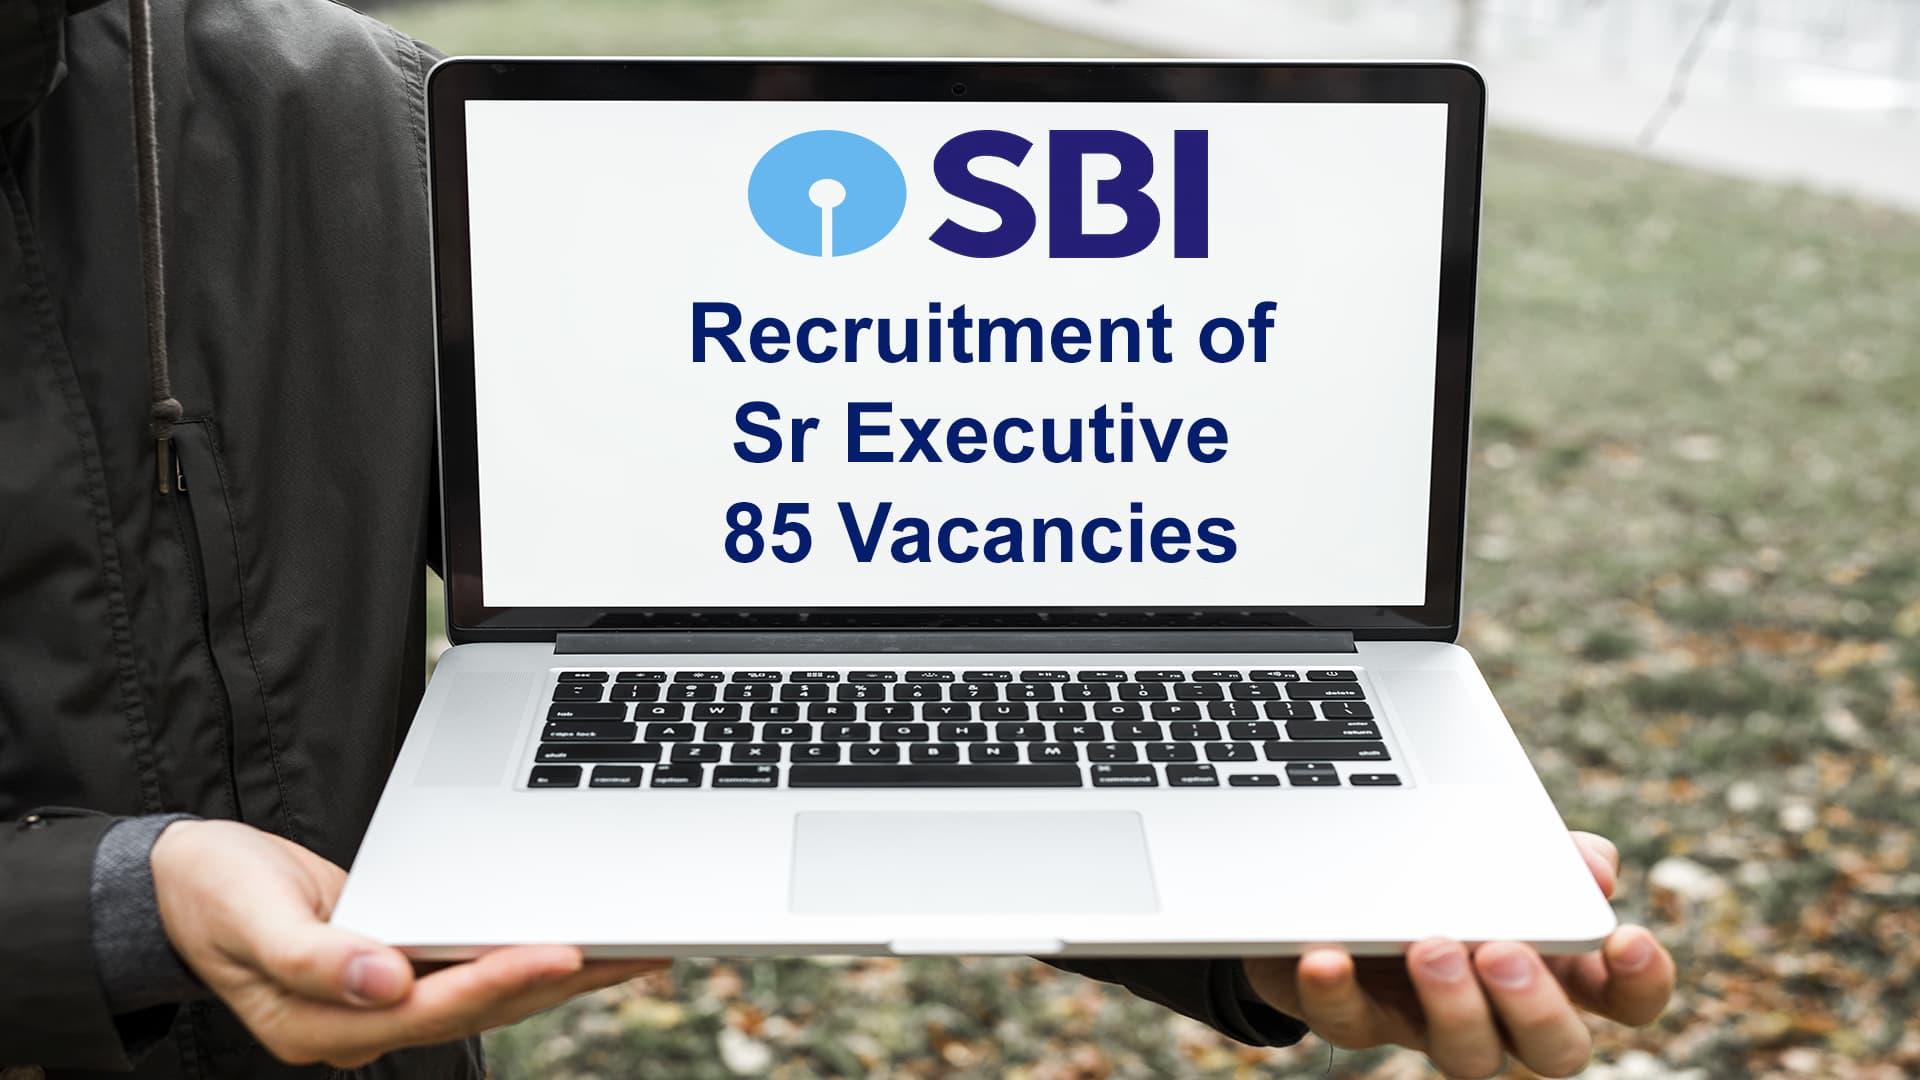 SBI Recruitment of Sr Executive